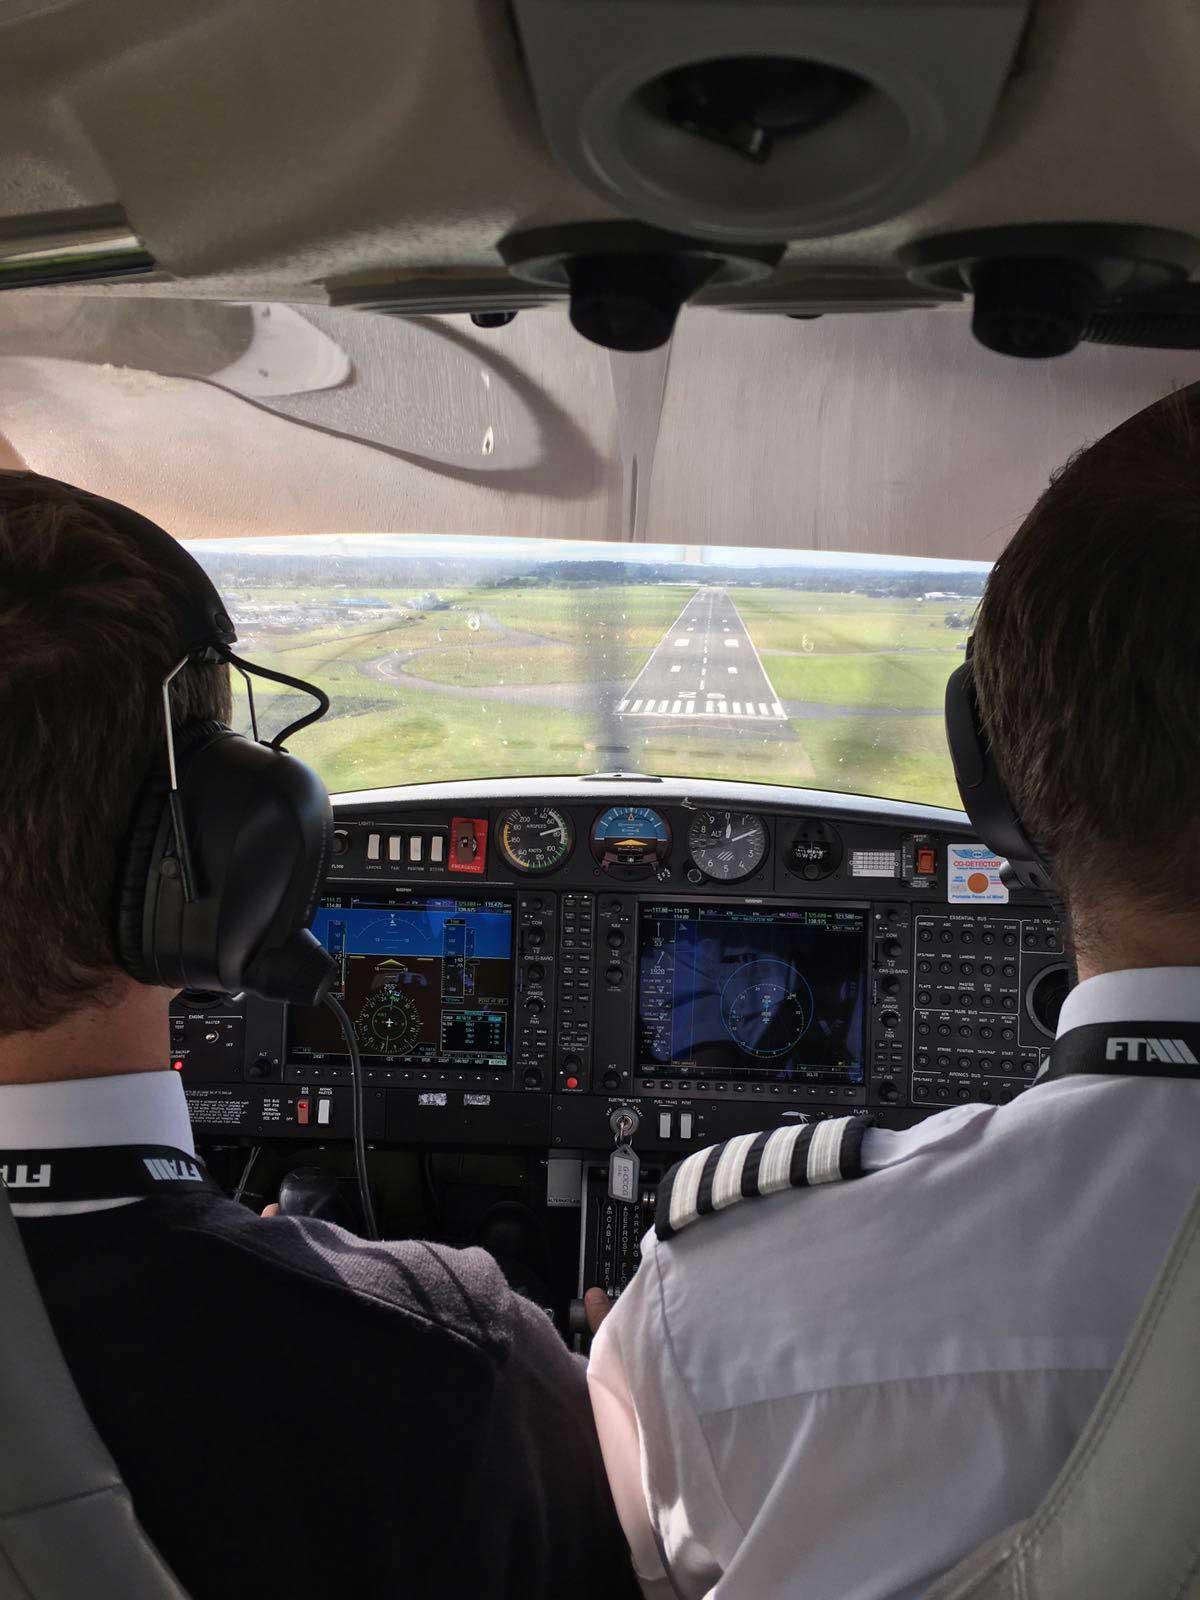 Bournemouth-Cadet-flying-web-1.jpg